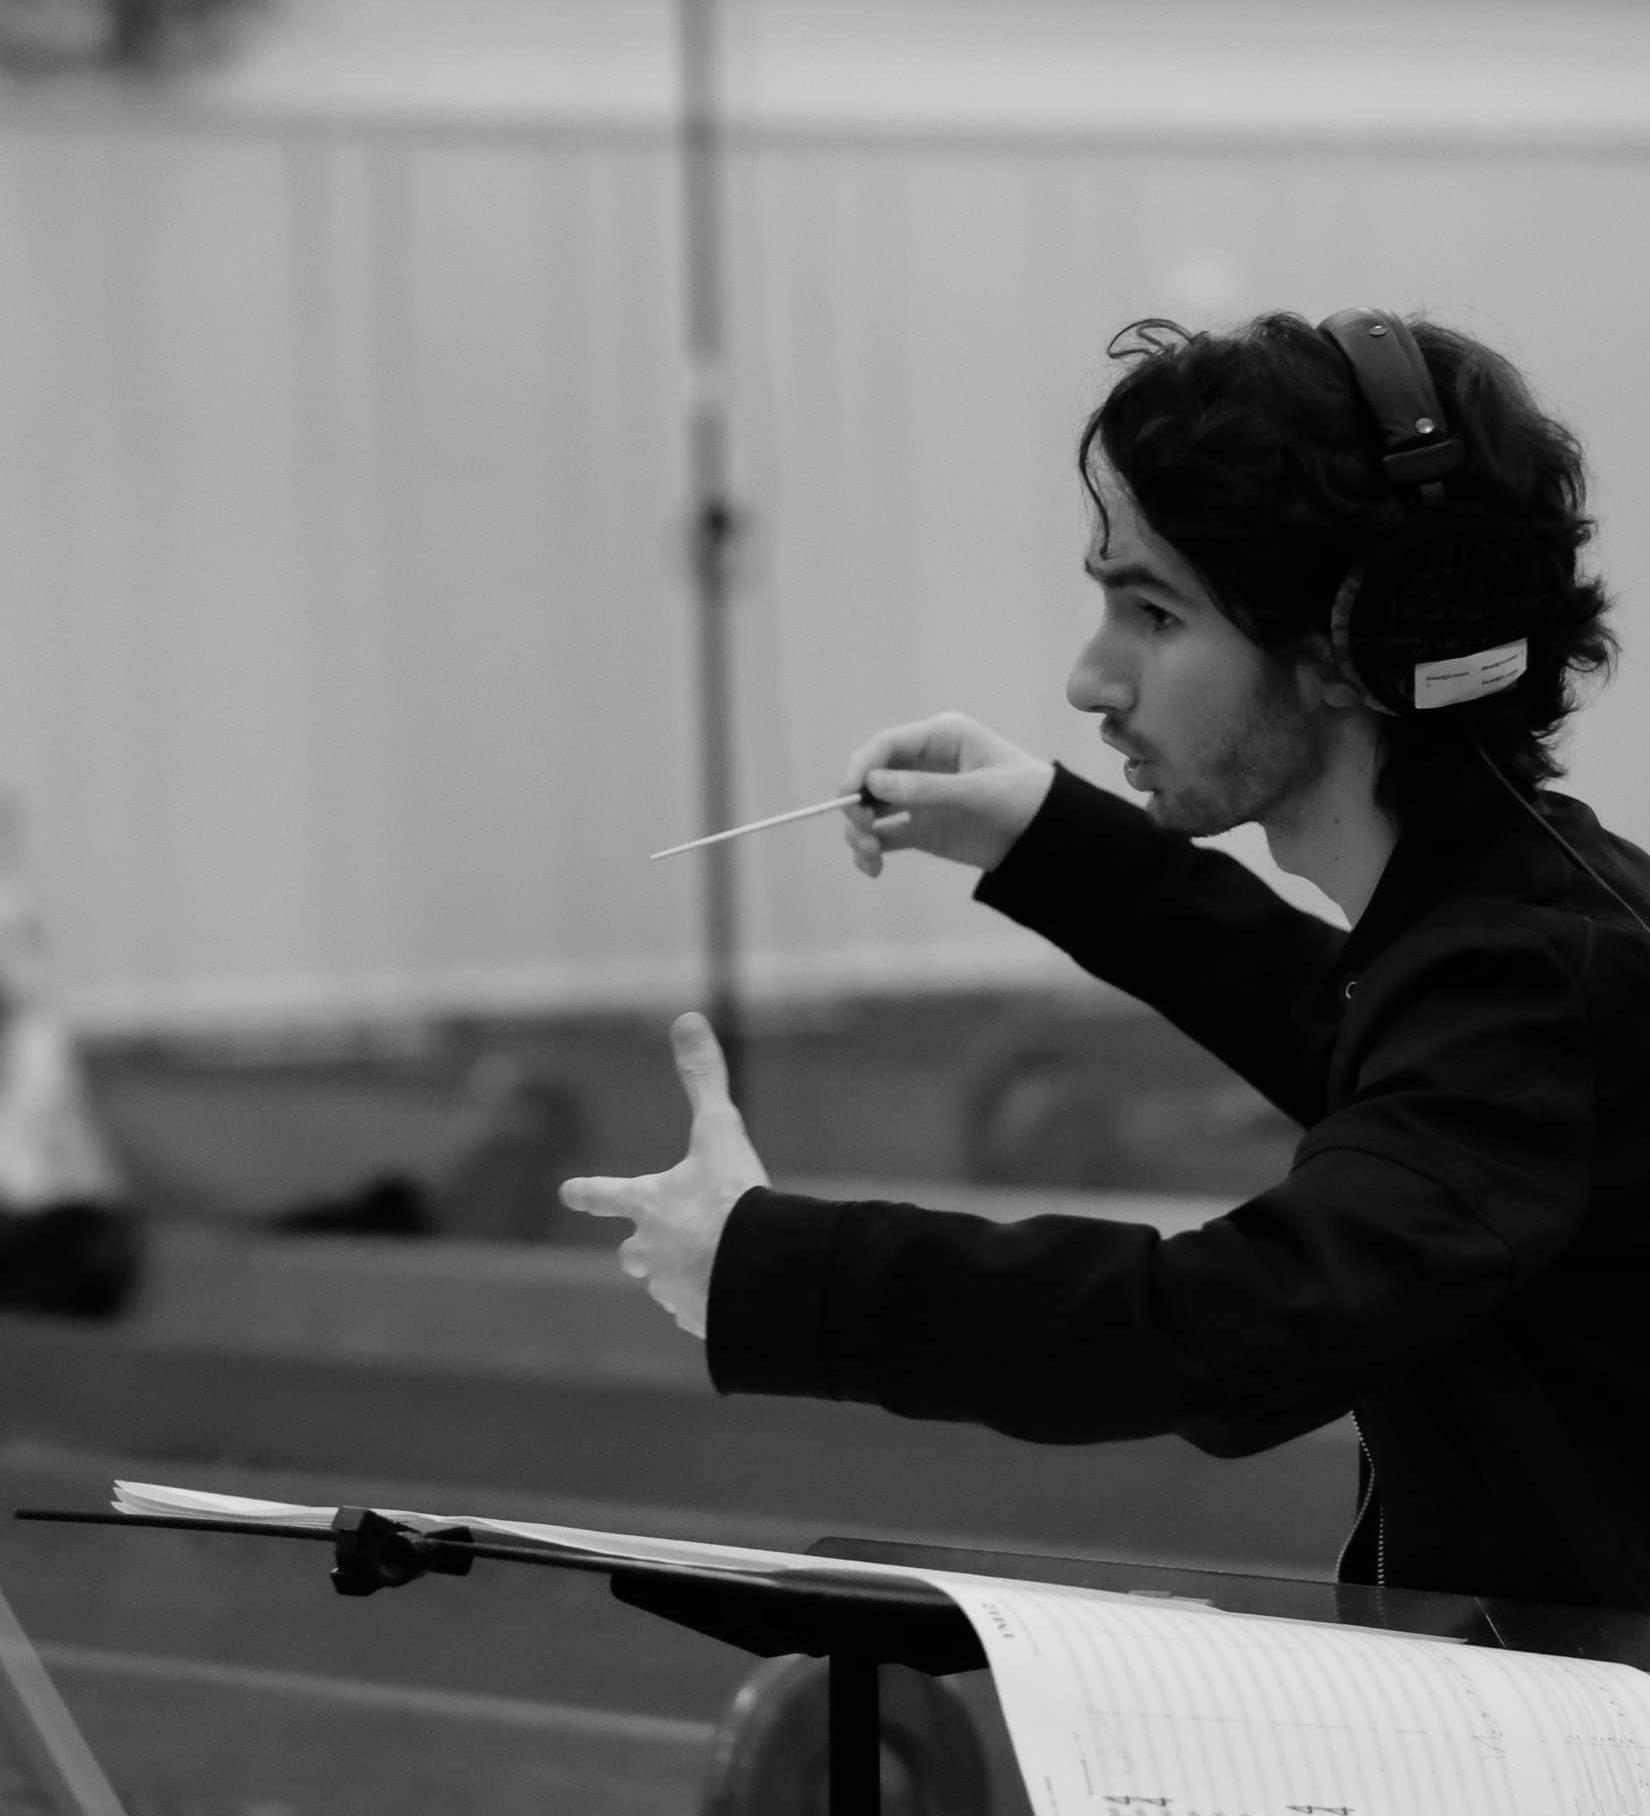 Pedro Osuna conducting at Berklee College of Music.